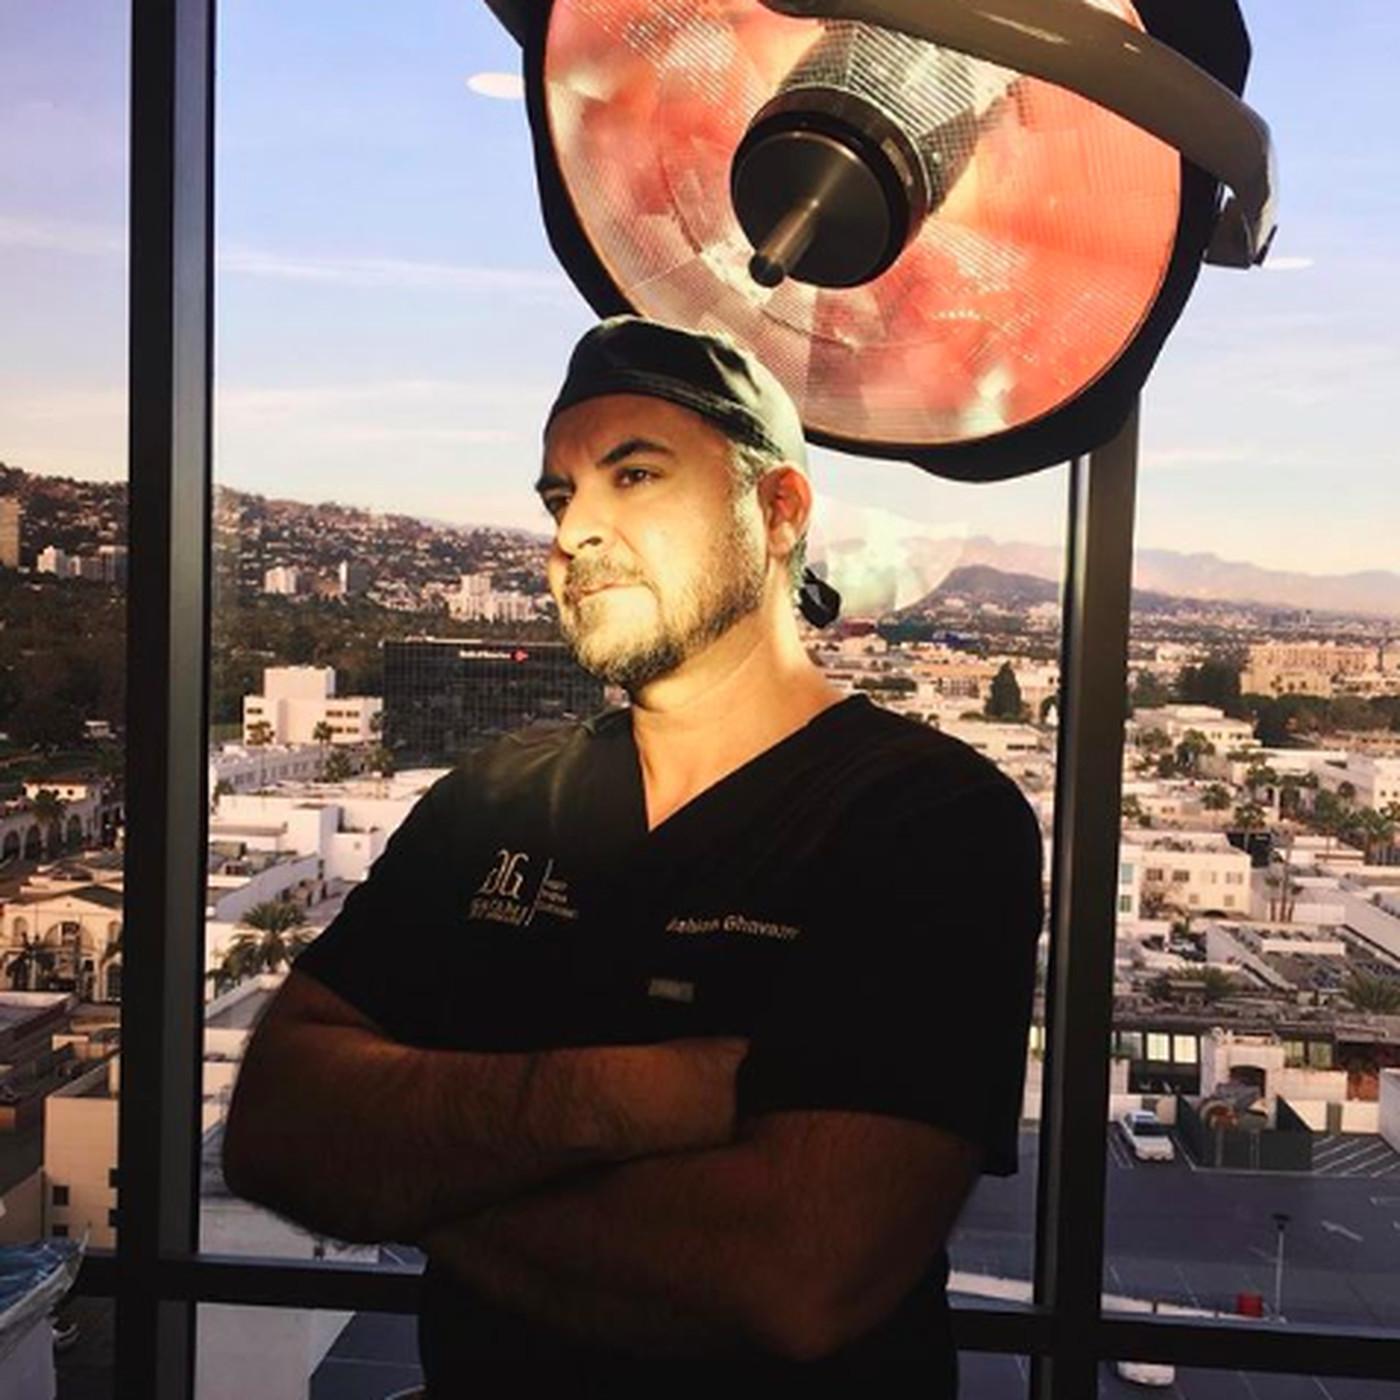 6e99514c3c8e8 Dr. Ashkan Gavami, the Instagram-famous plastic surgeon, talks medical  ethics - Vox